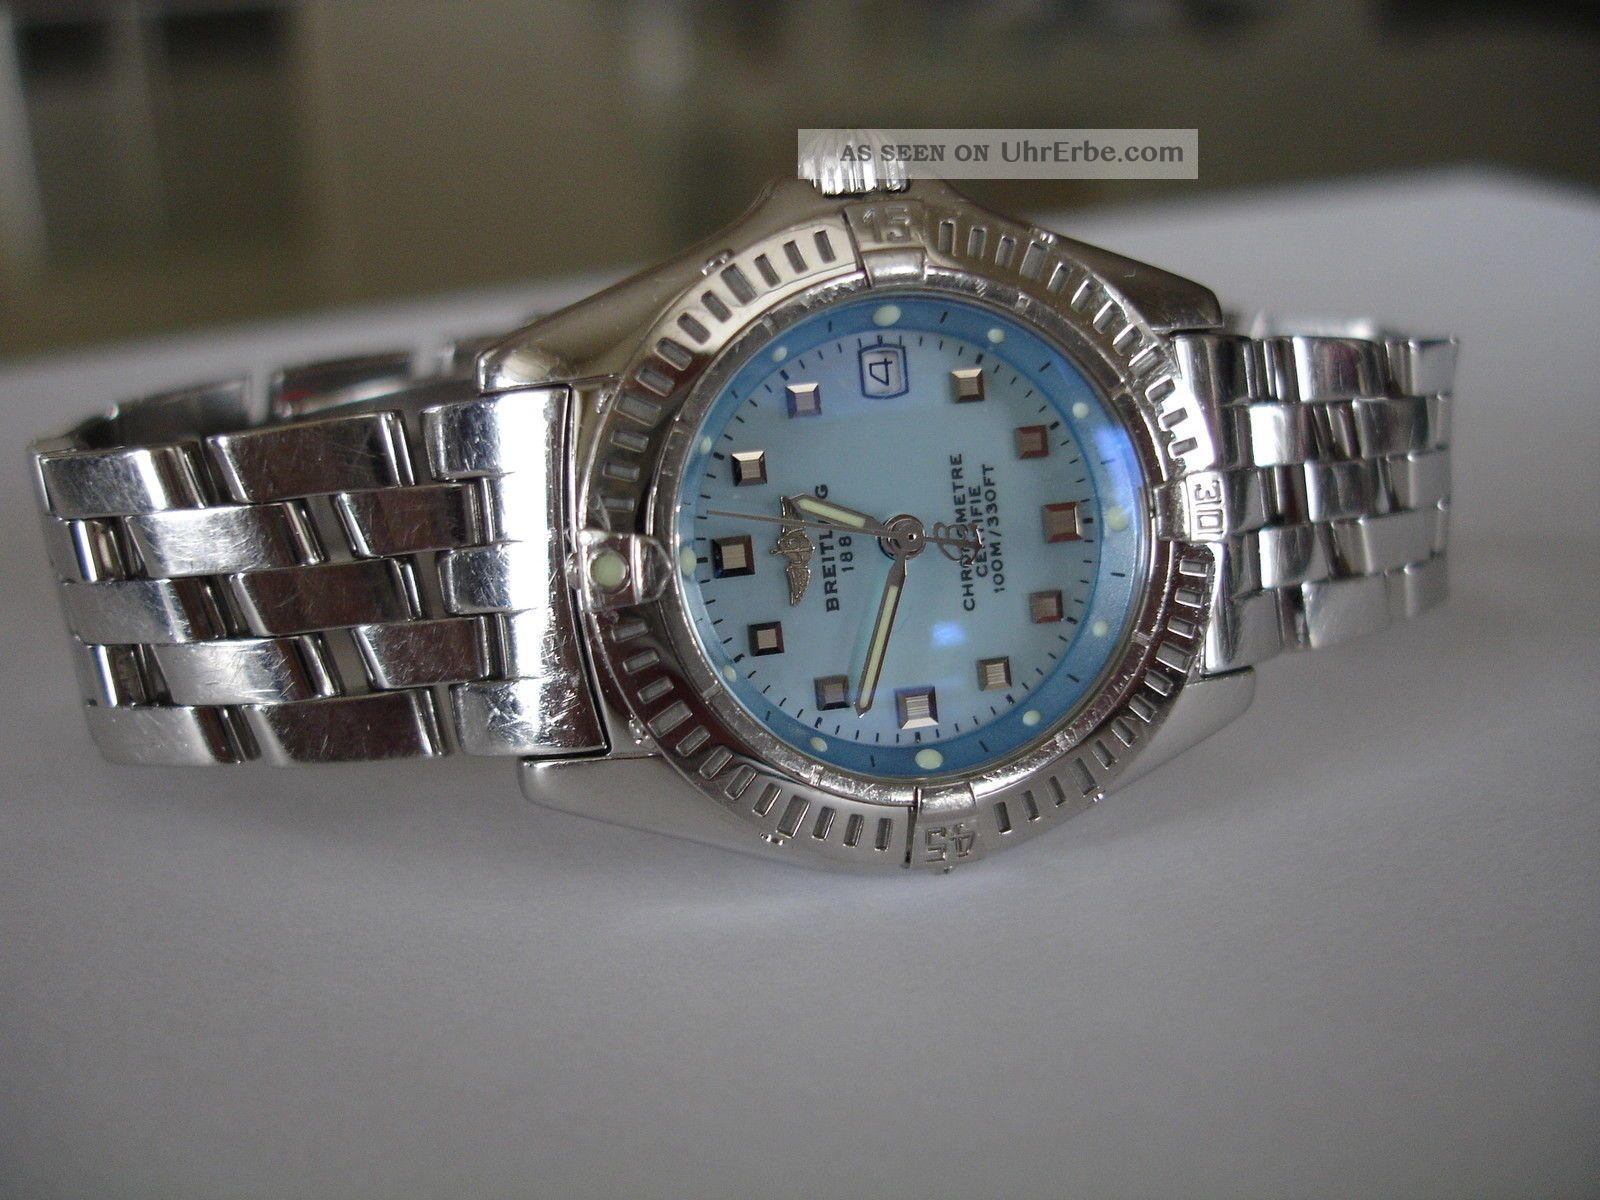 Breitling Callistino Stahl Uhr/ Watch A72345 Pilot Band/ Bracelet Armbanduhren Bild